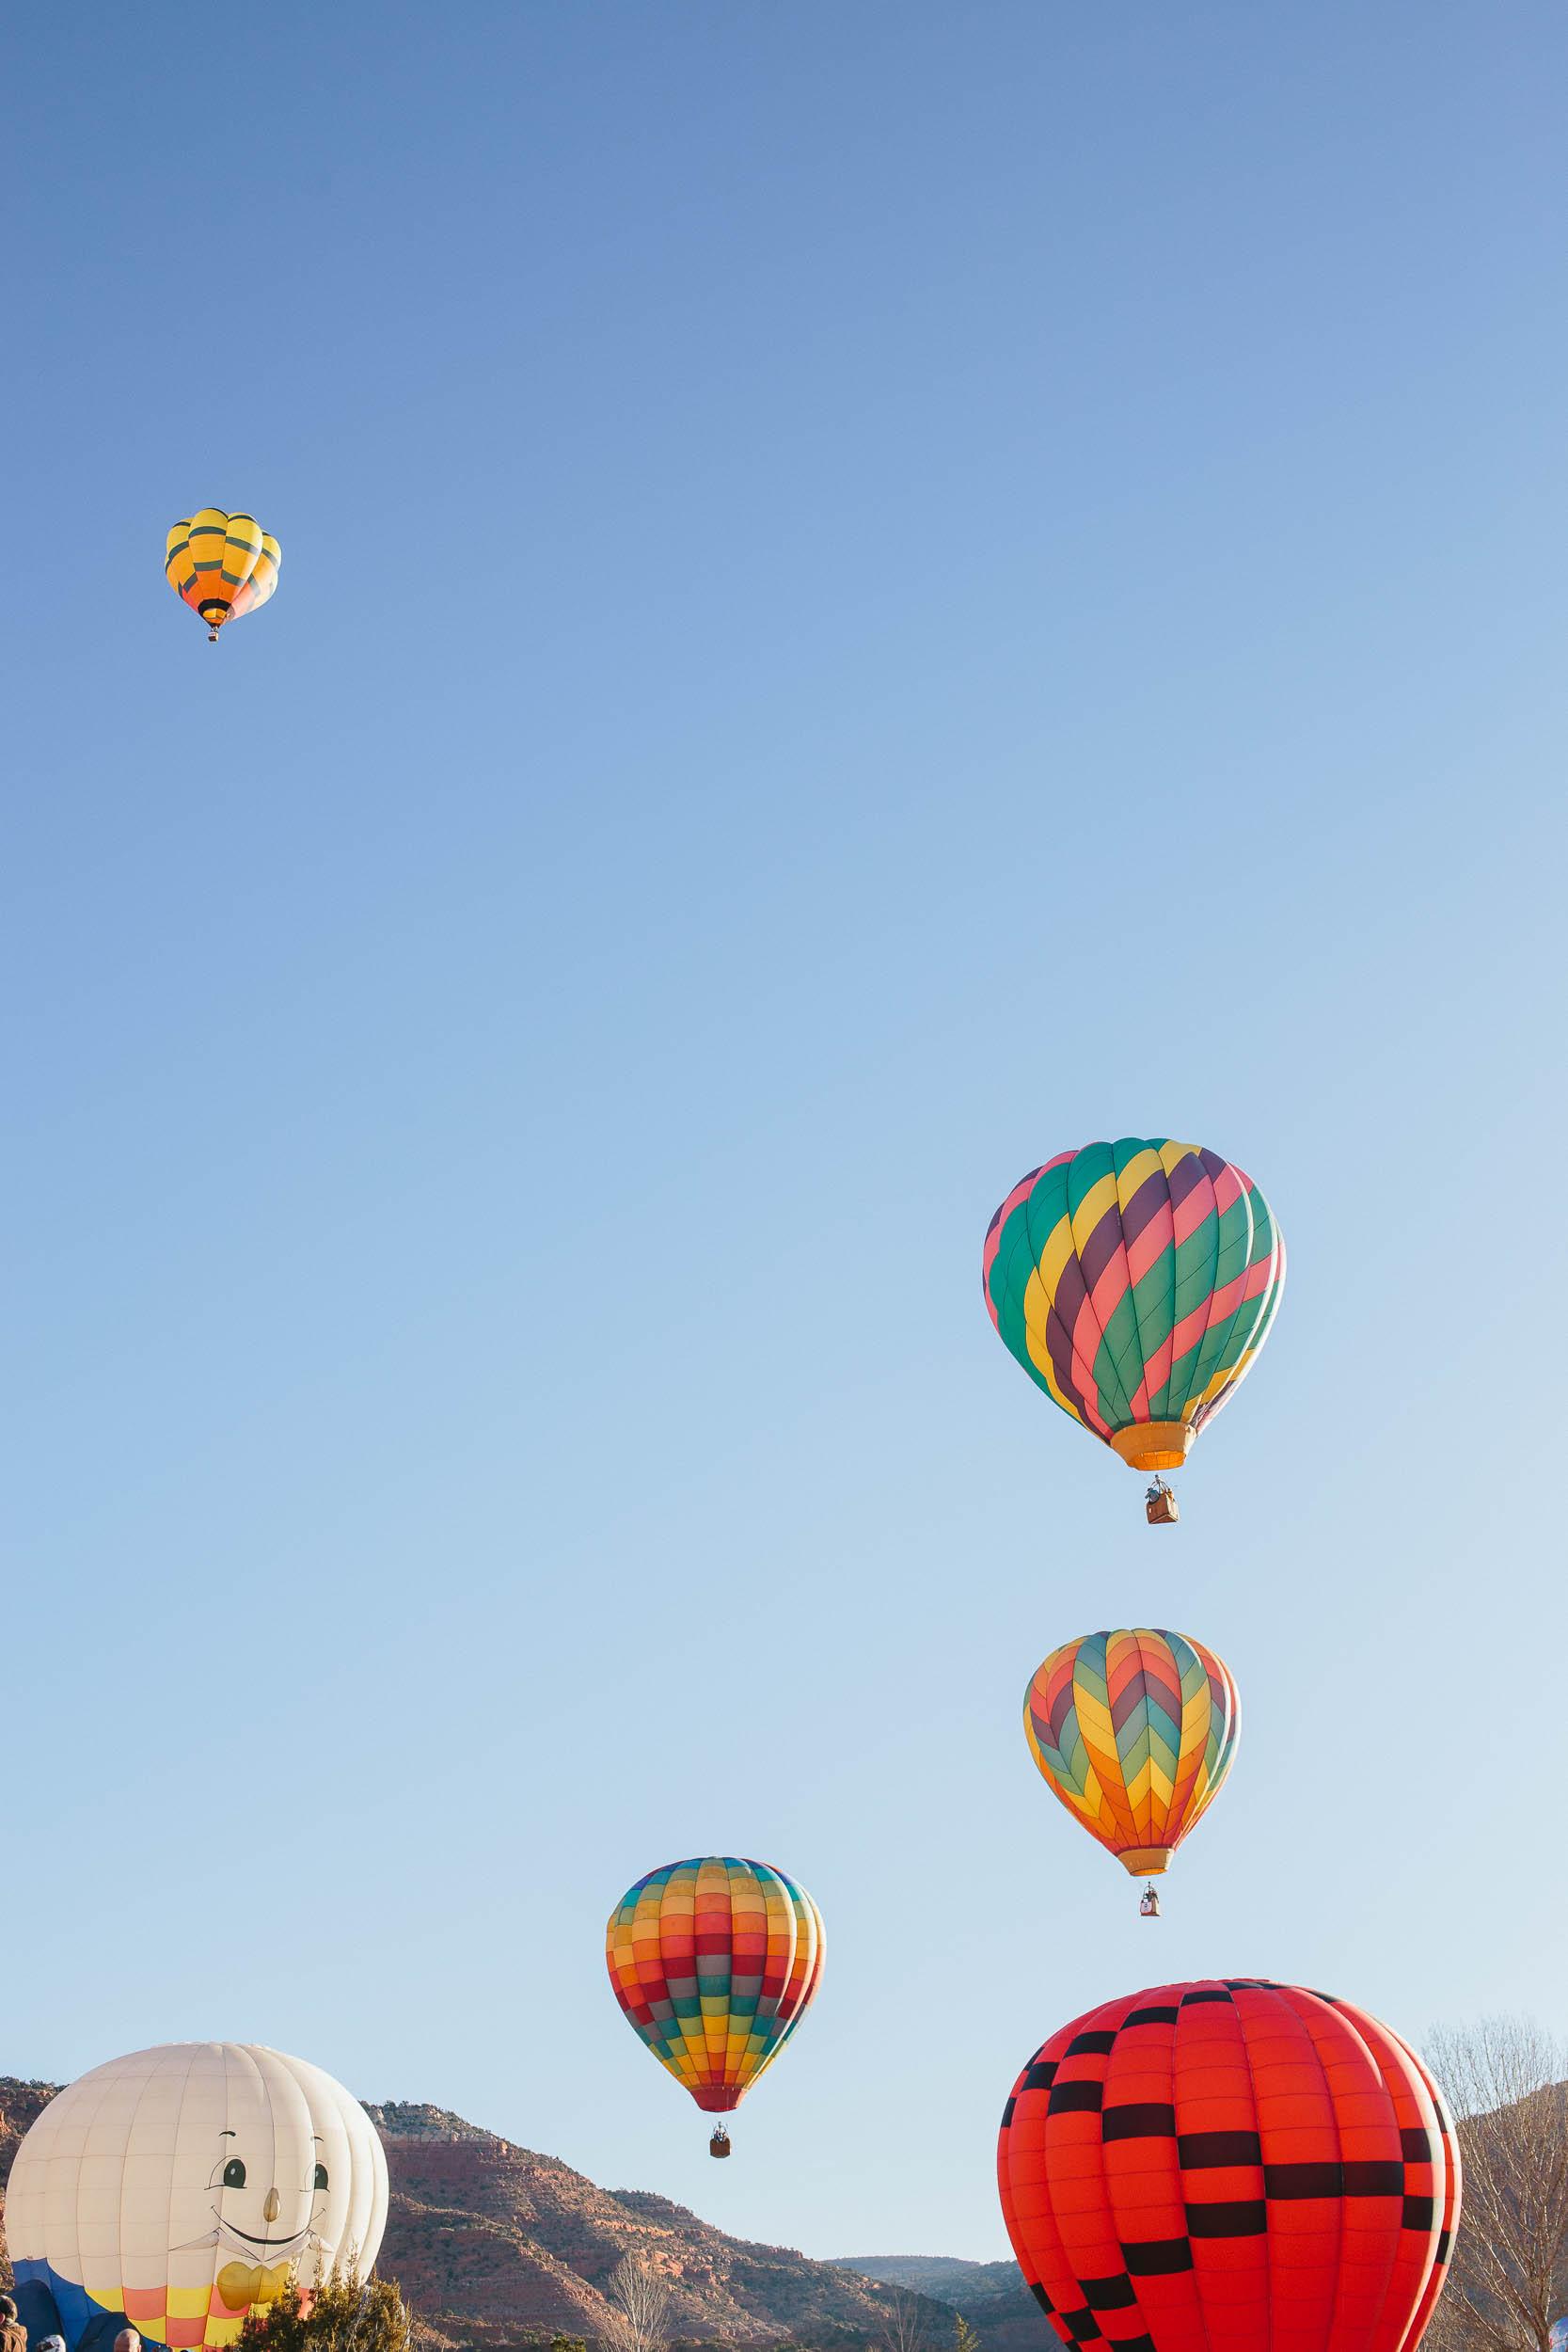 Kyle-Sheppard-Kanab-Balloon-Festival-26.jpg